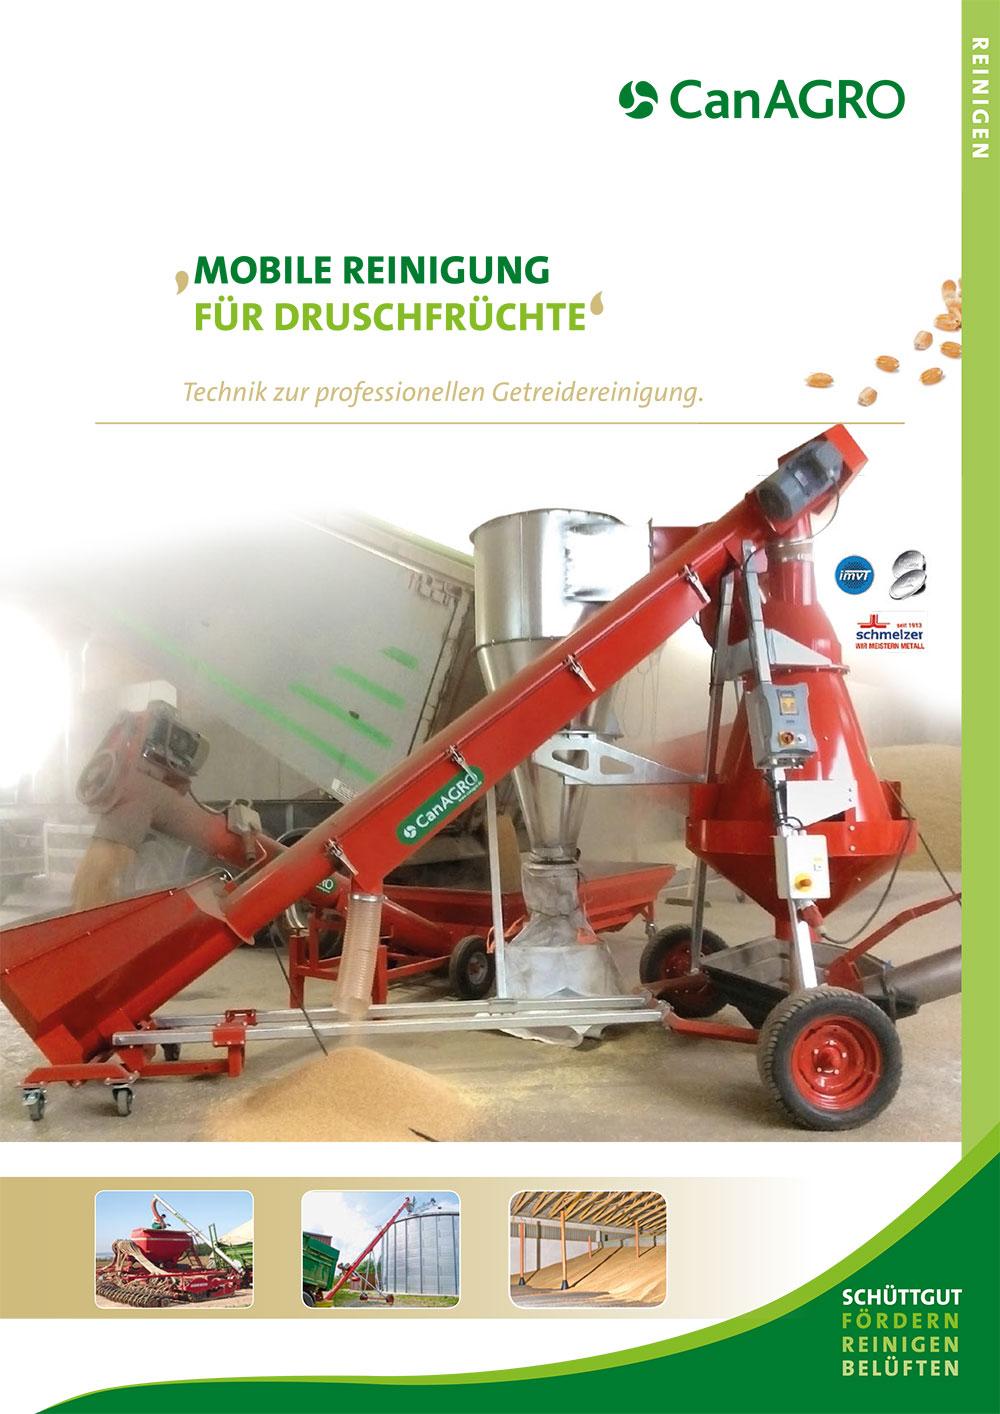 CanAGRO - PDF: Reinigung